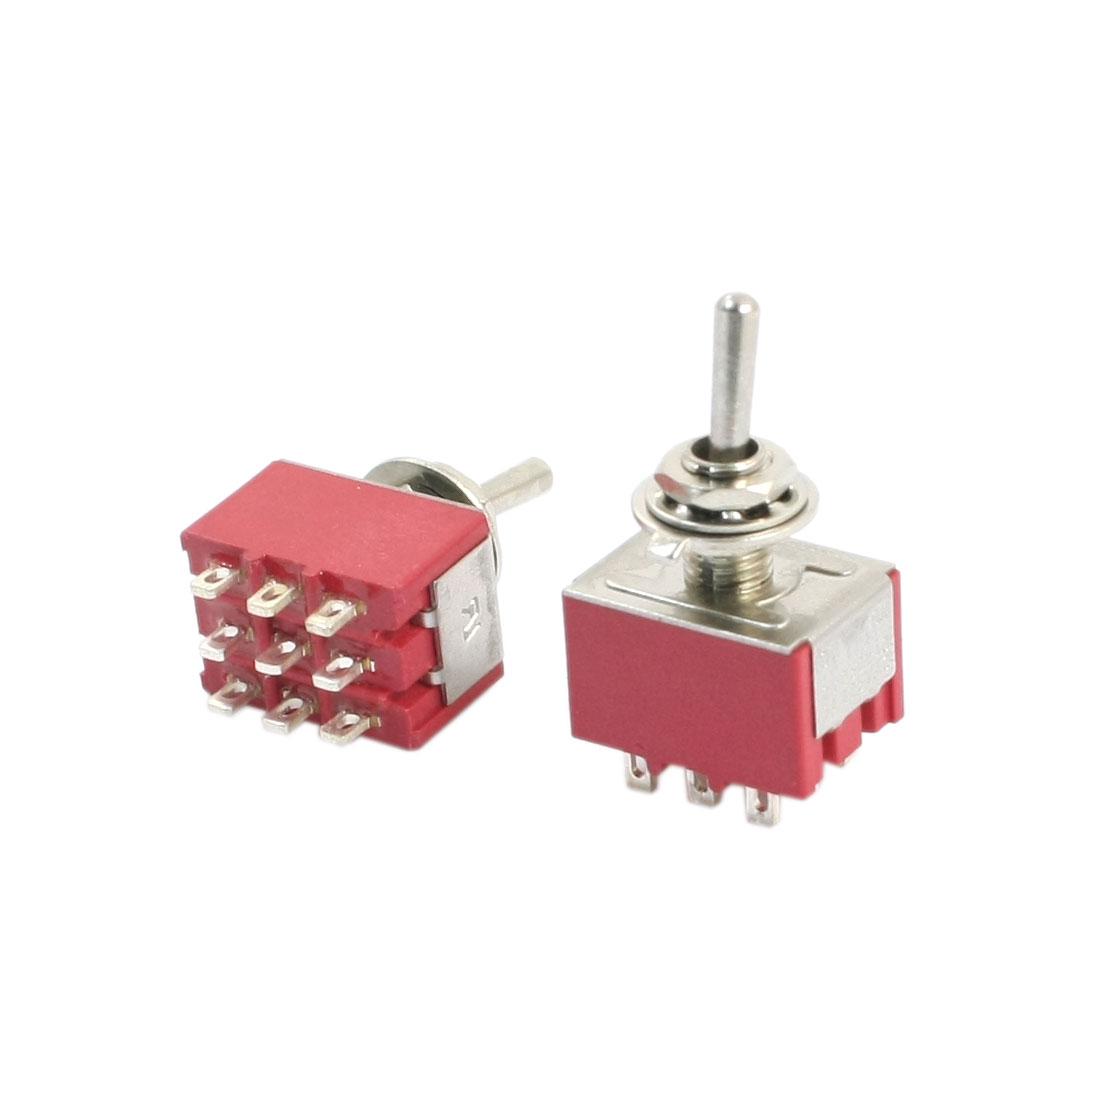 2Pcs AC125V 5A AC250V 2A Rocker Type 3PDT Latching 9 Terminals Toggle Switch